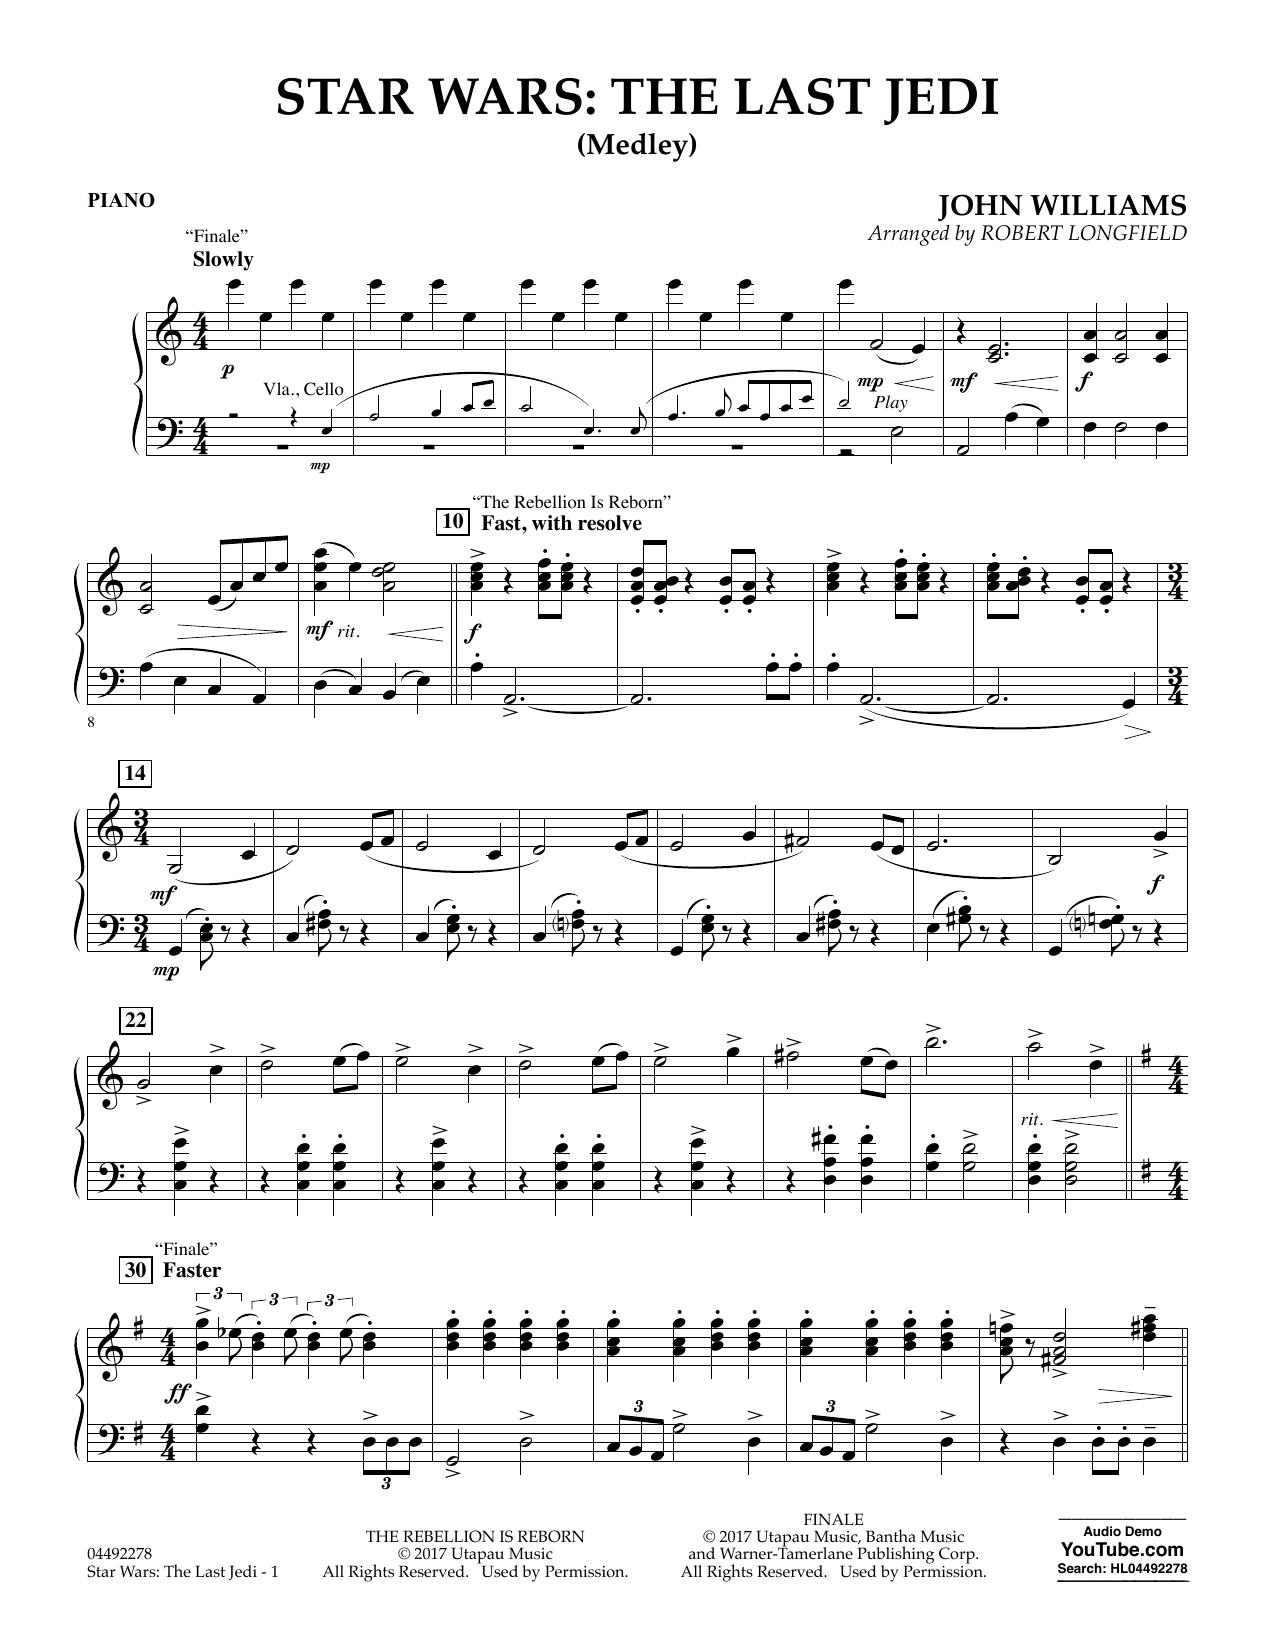 Star Wars: The Last Jedi (Medley) (arr. Robert Longfield) - Piano (Orchestra)